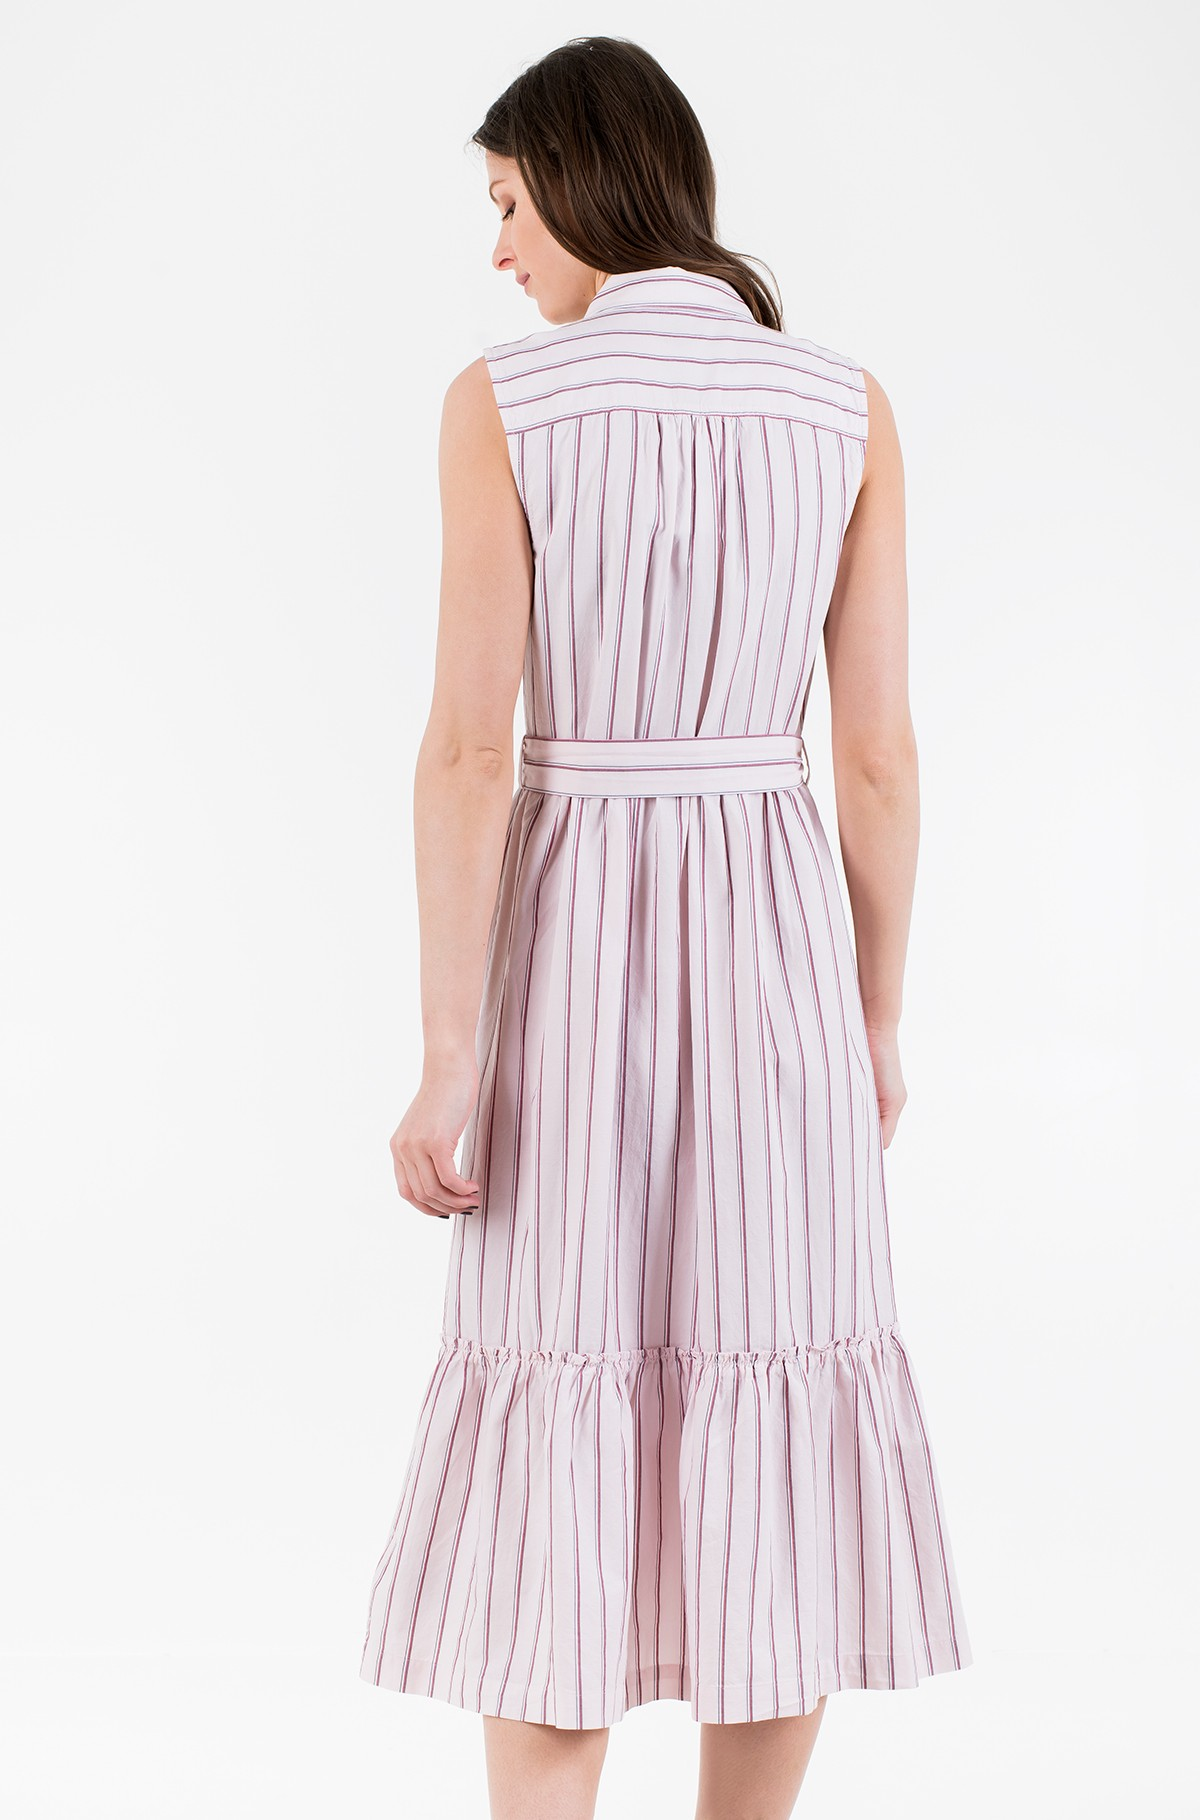 Midi dress PHOEBE SHIRT DRESS NS-full-2